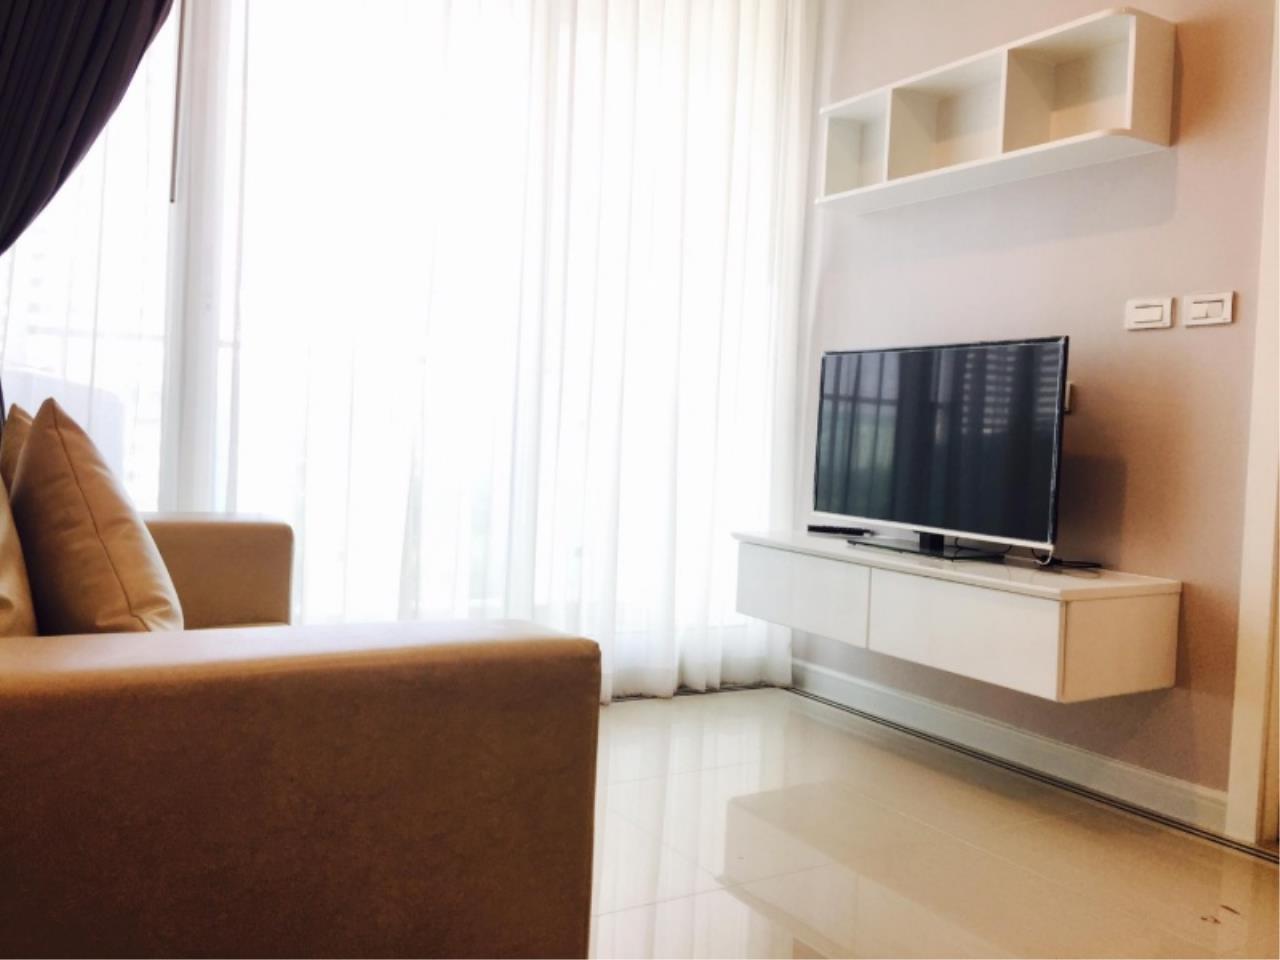 Century21 Skylux Agency's T.C. Green / Condo For Sale / 1 Bedroom / 35 SQM / MRT Phra Ram 9 / Bangkok 1